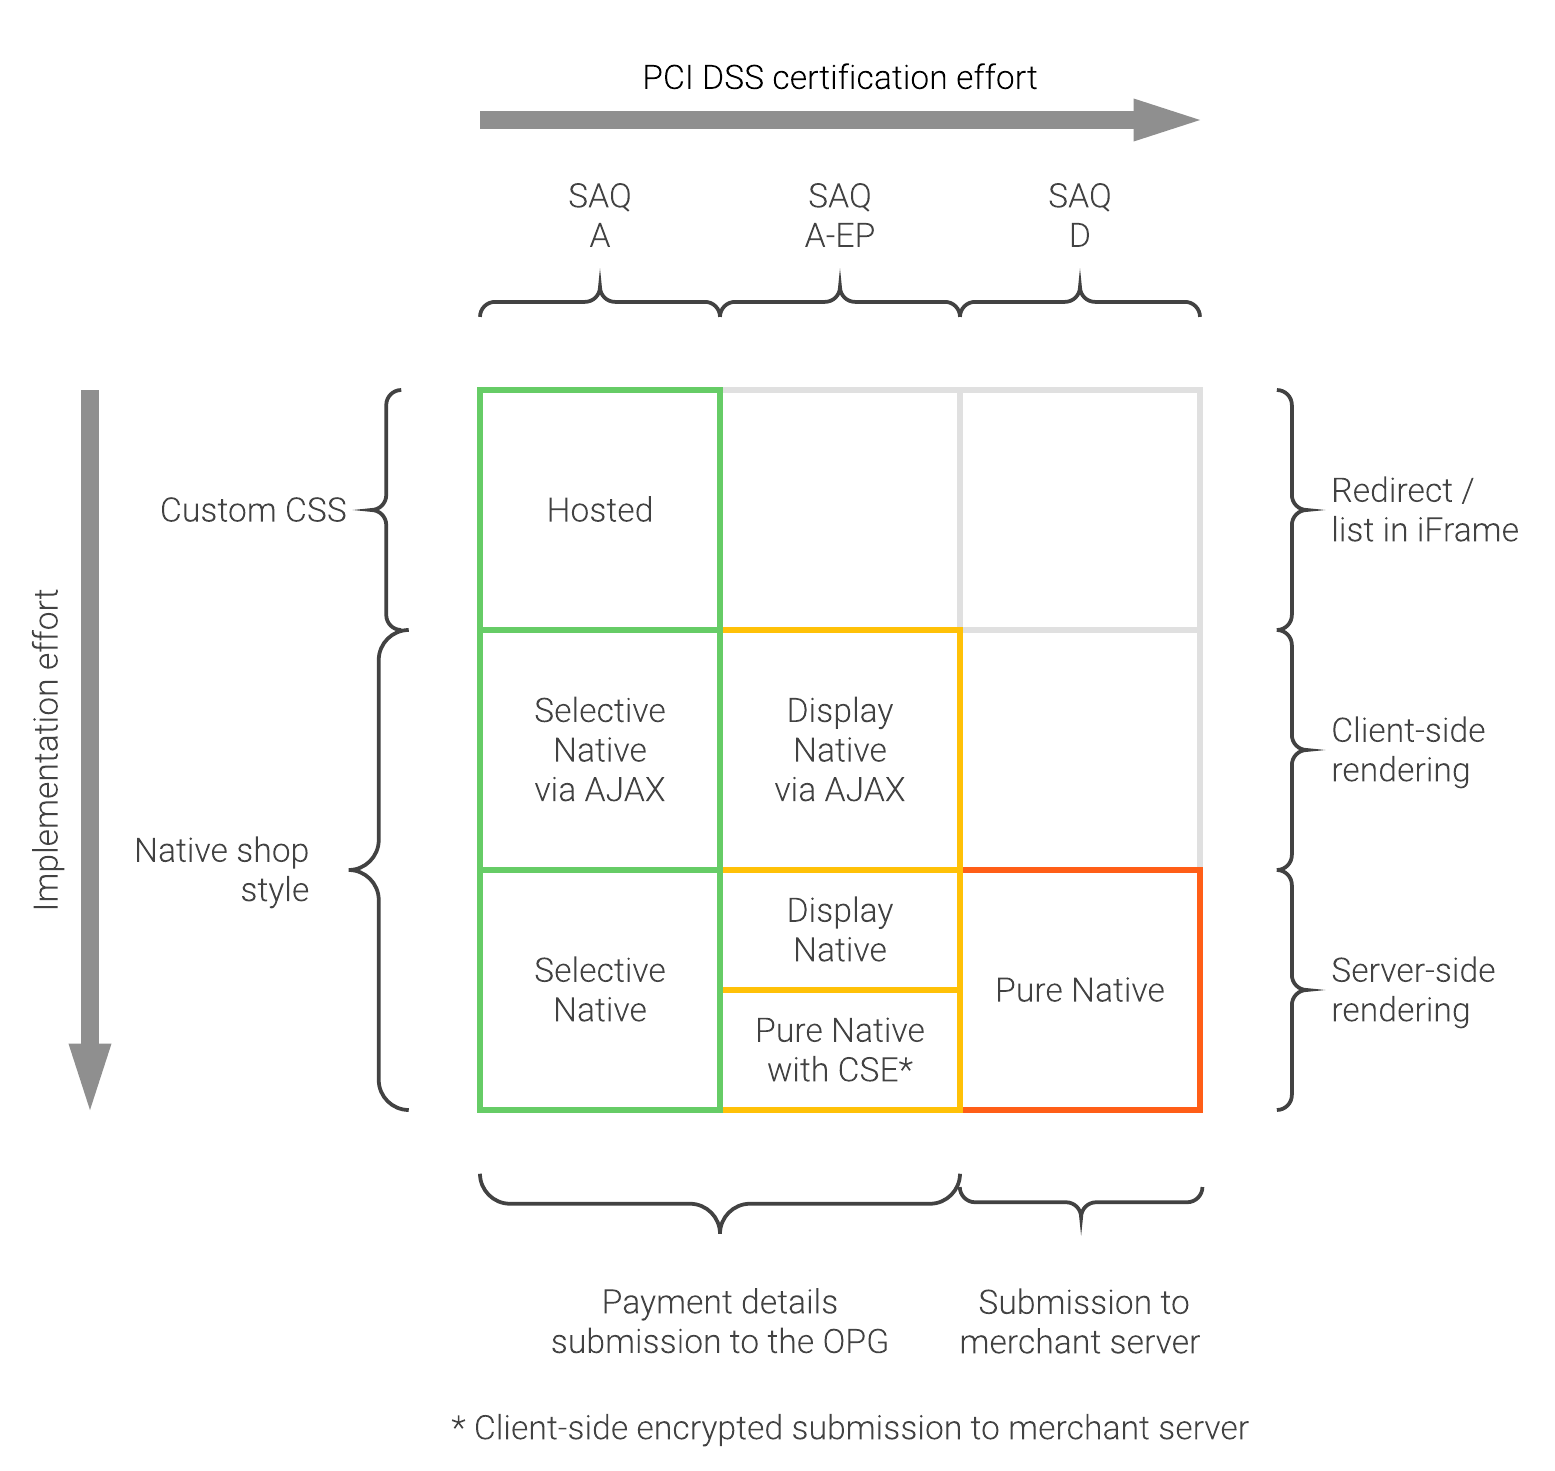 concept matrix visualization